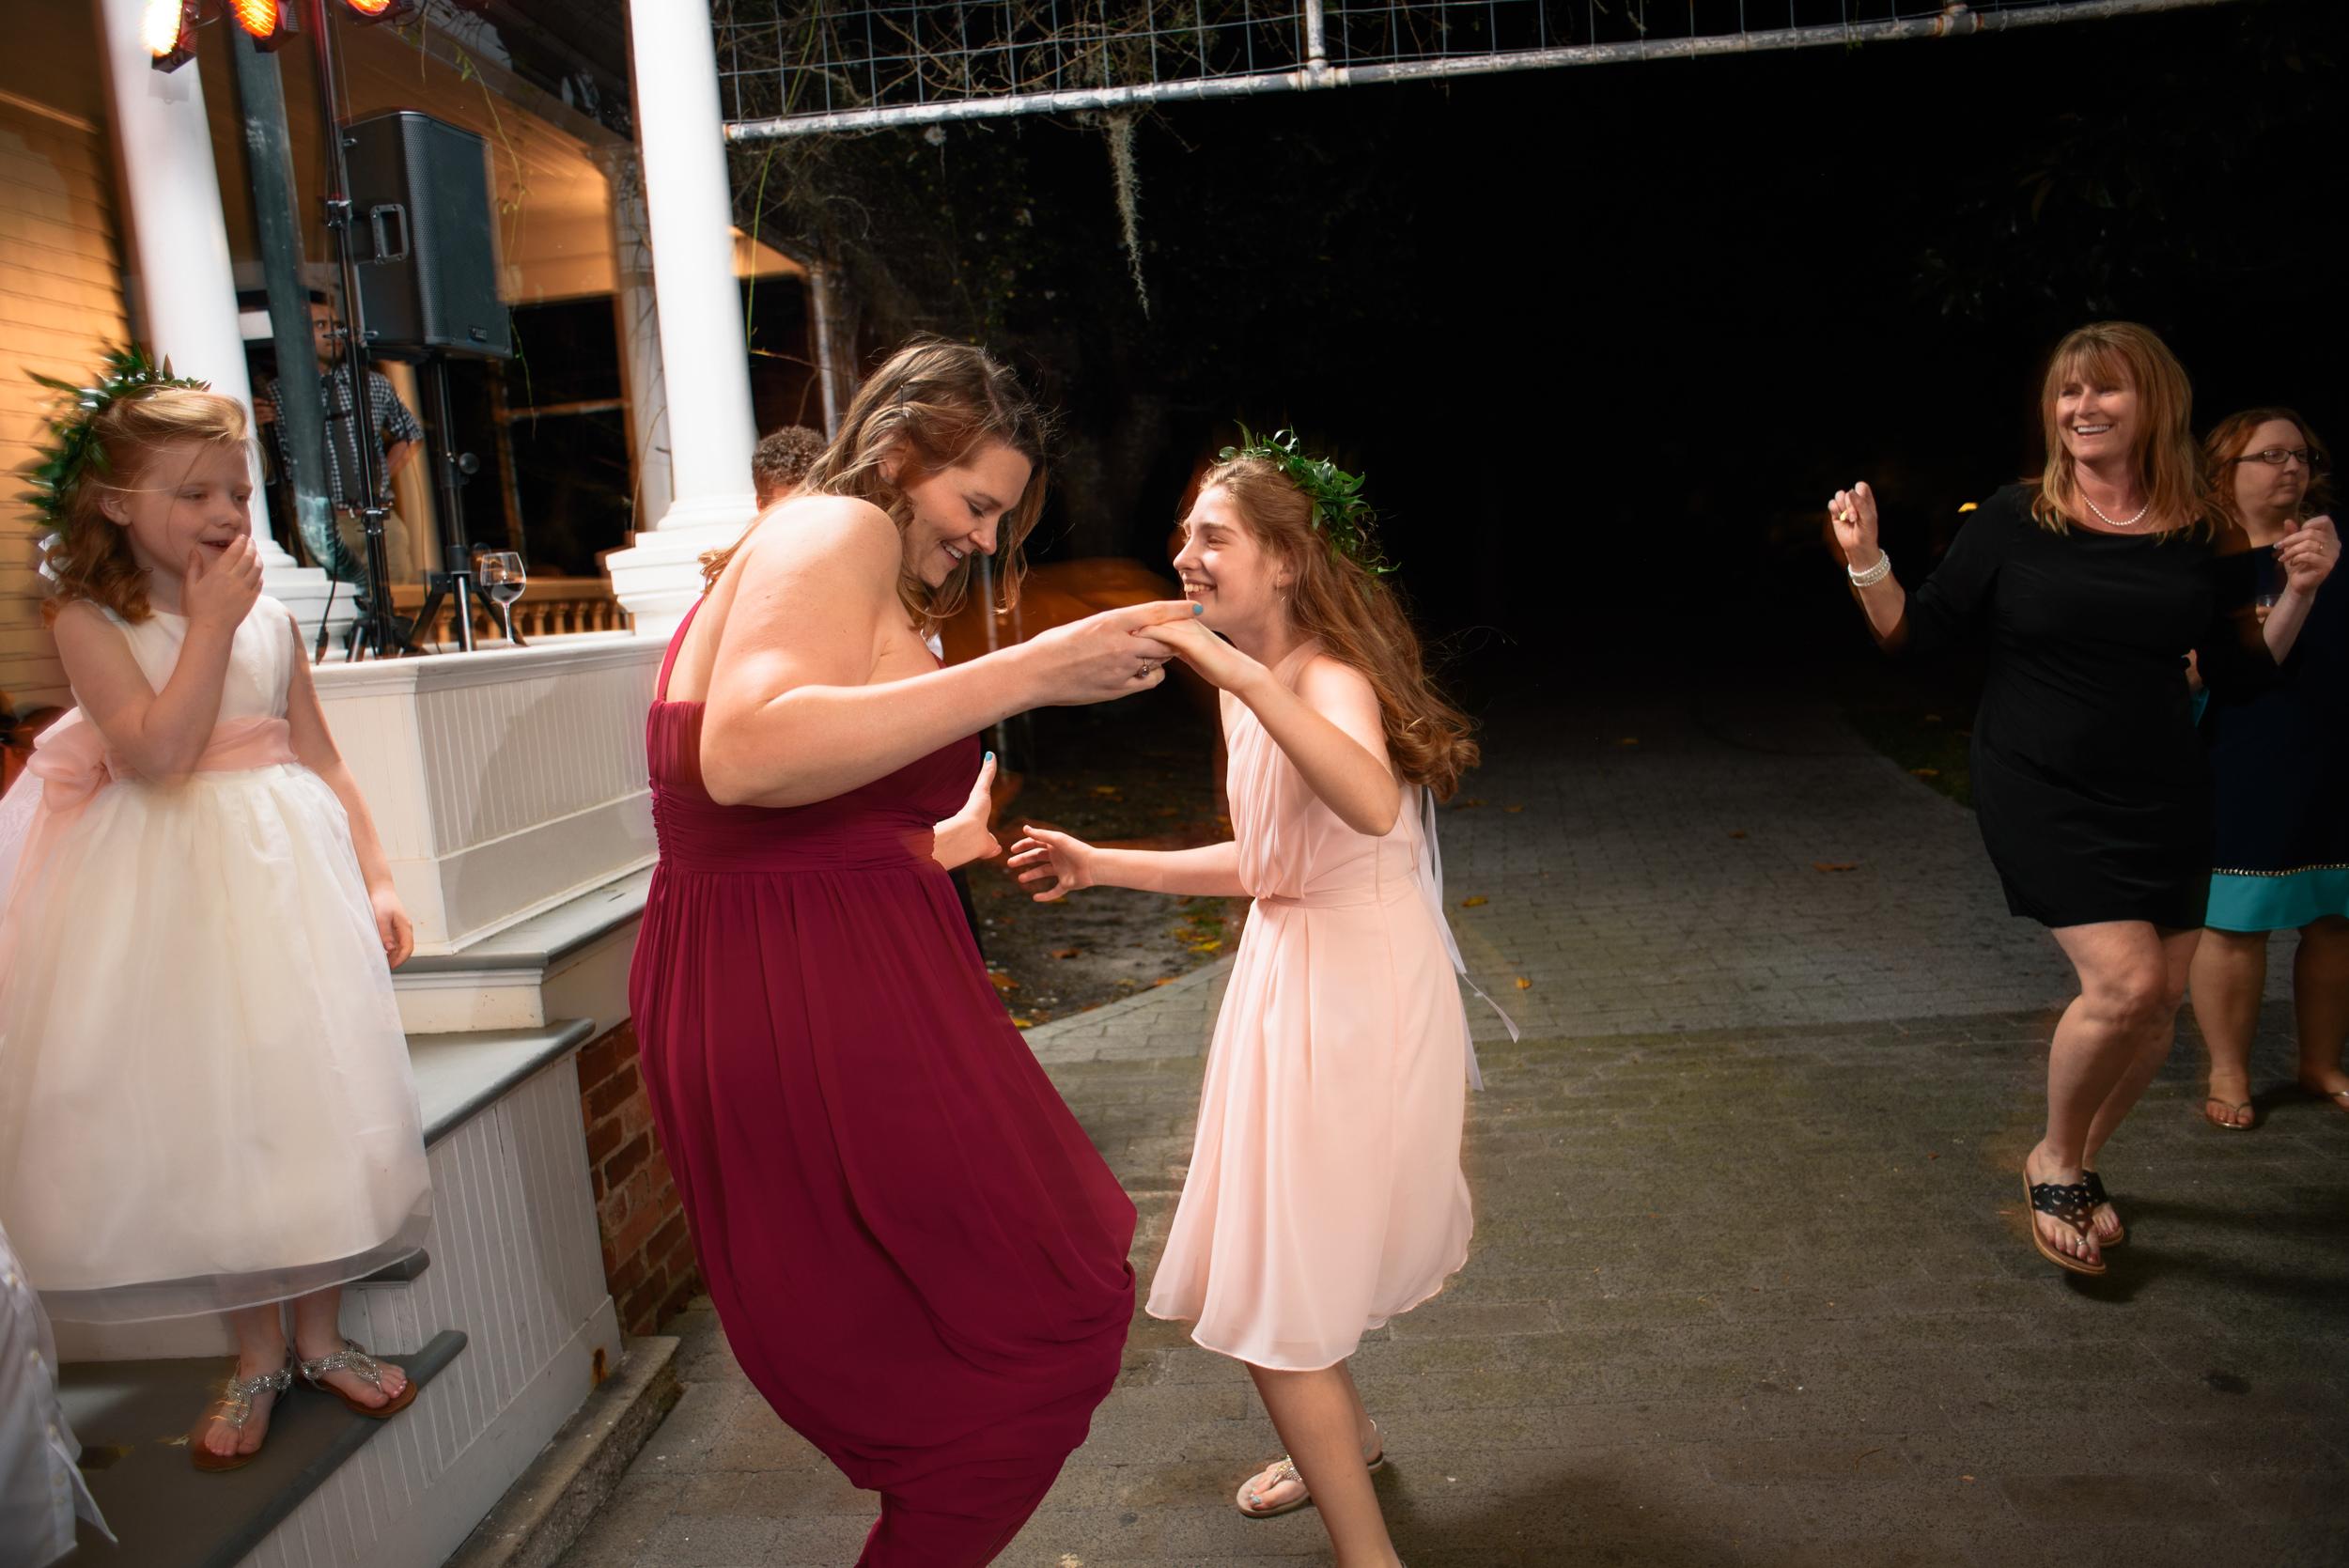 kadi-and-matt-carroll-april-9-2016-jekyl-island-wedding-m-newsom-photography- (10 of 67).jpg